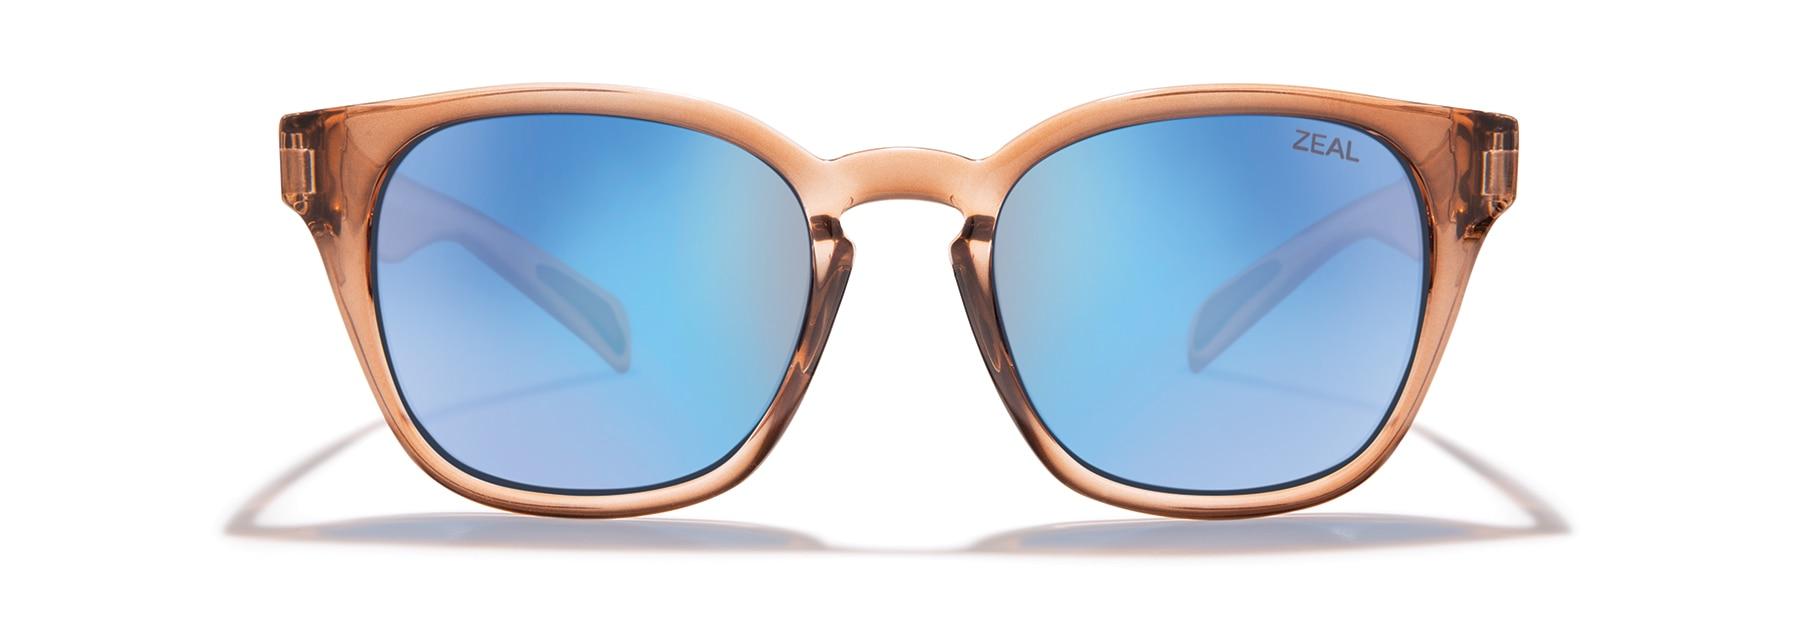 aca0ff8b2d0 Shop WINDSOR (Z1476) Sunglasses by Zeal